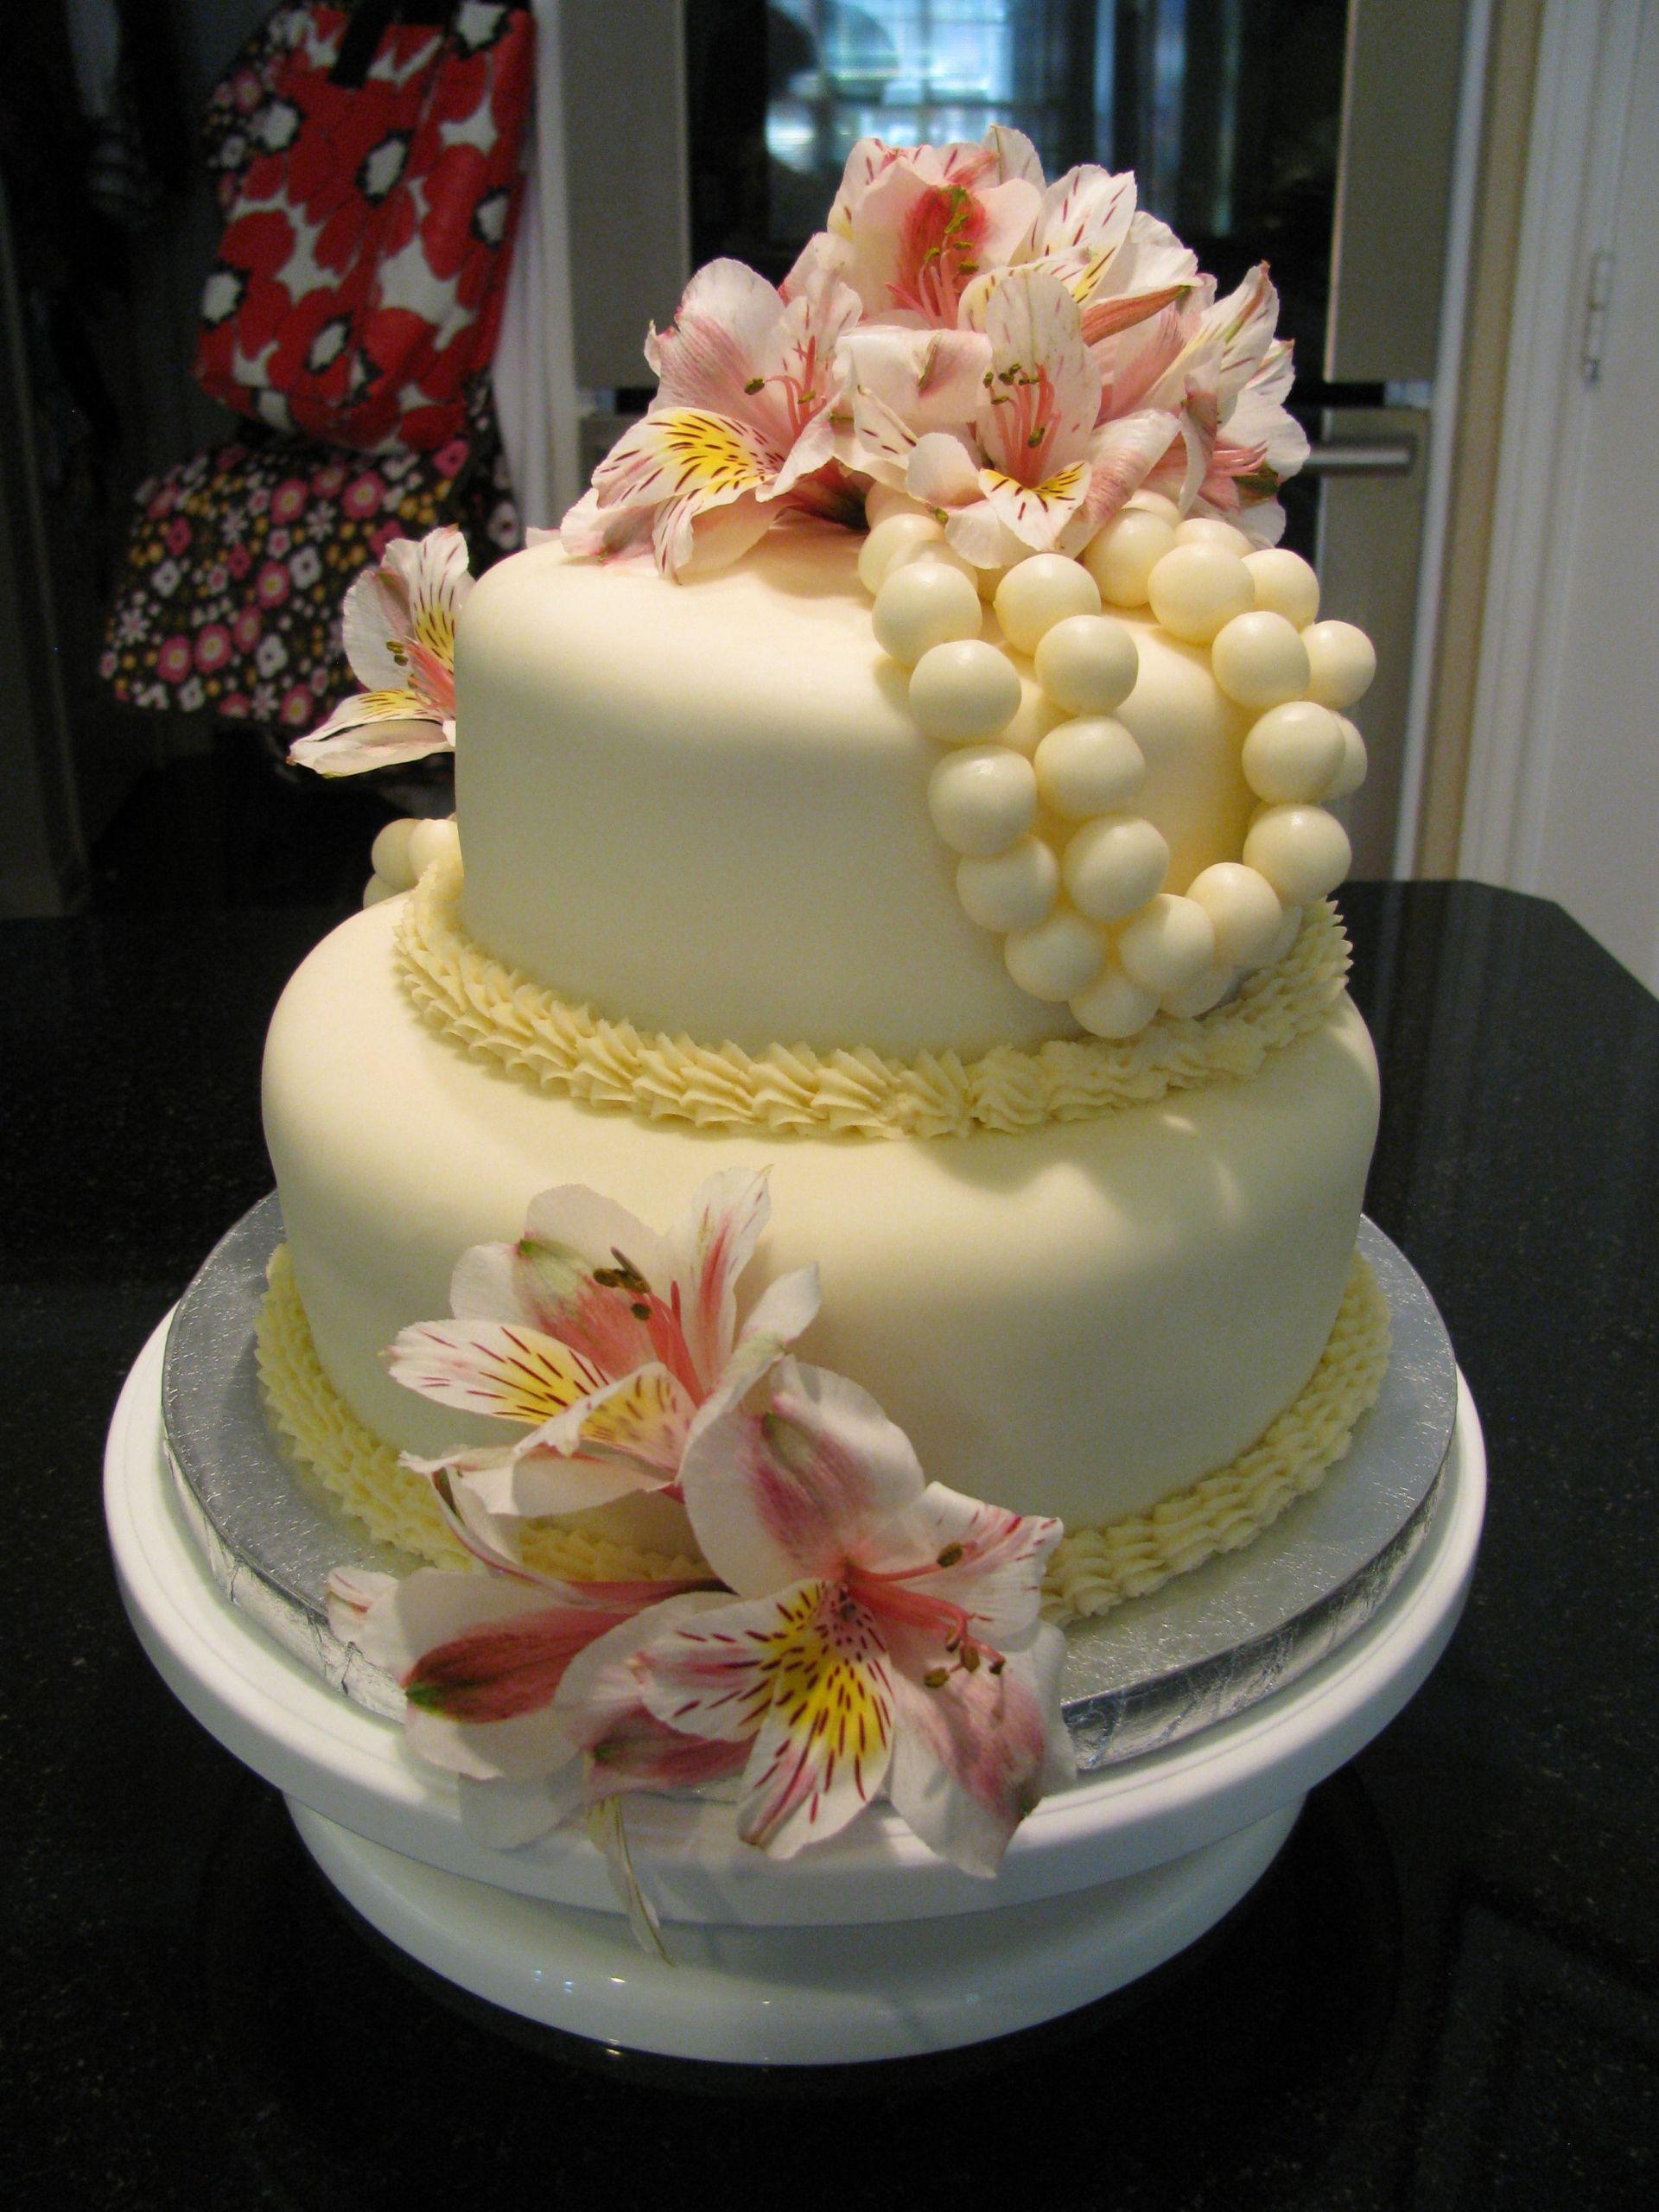 75th Birthday Cakes  Pinterest 75th Birthday Cake Ideas 1159